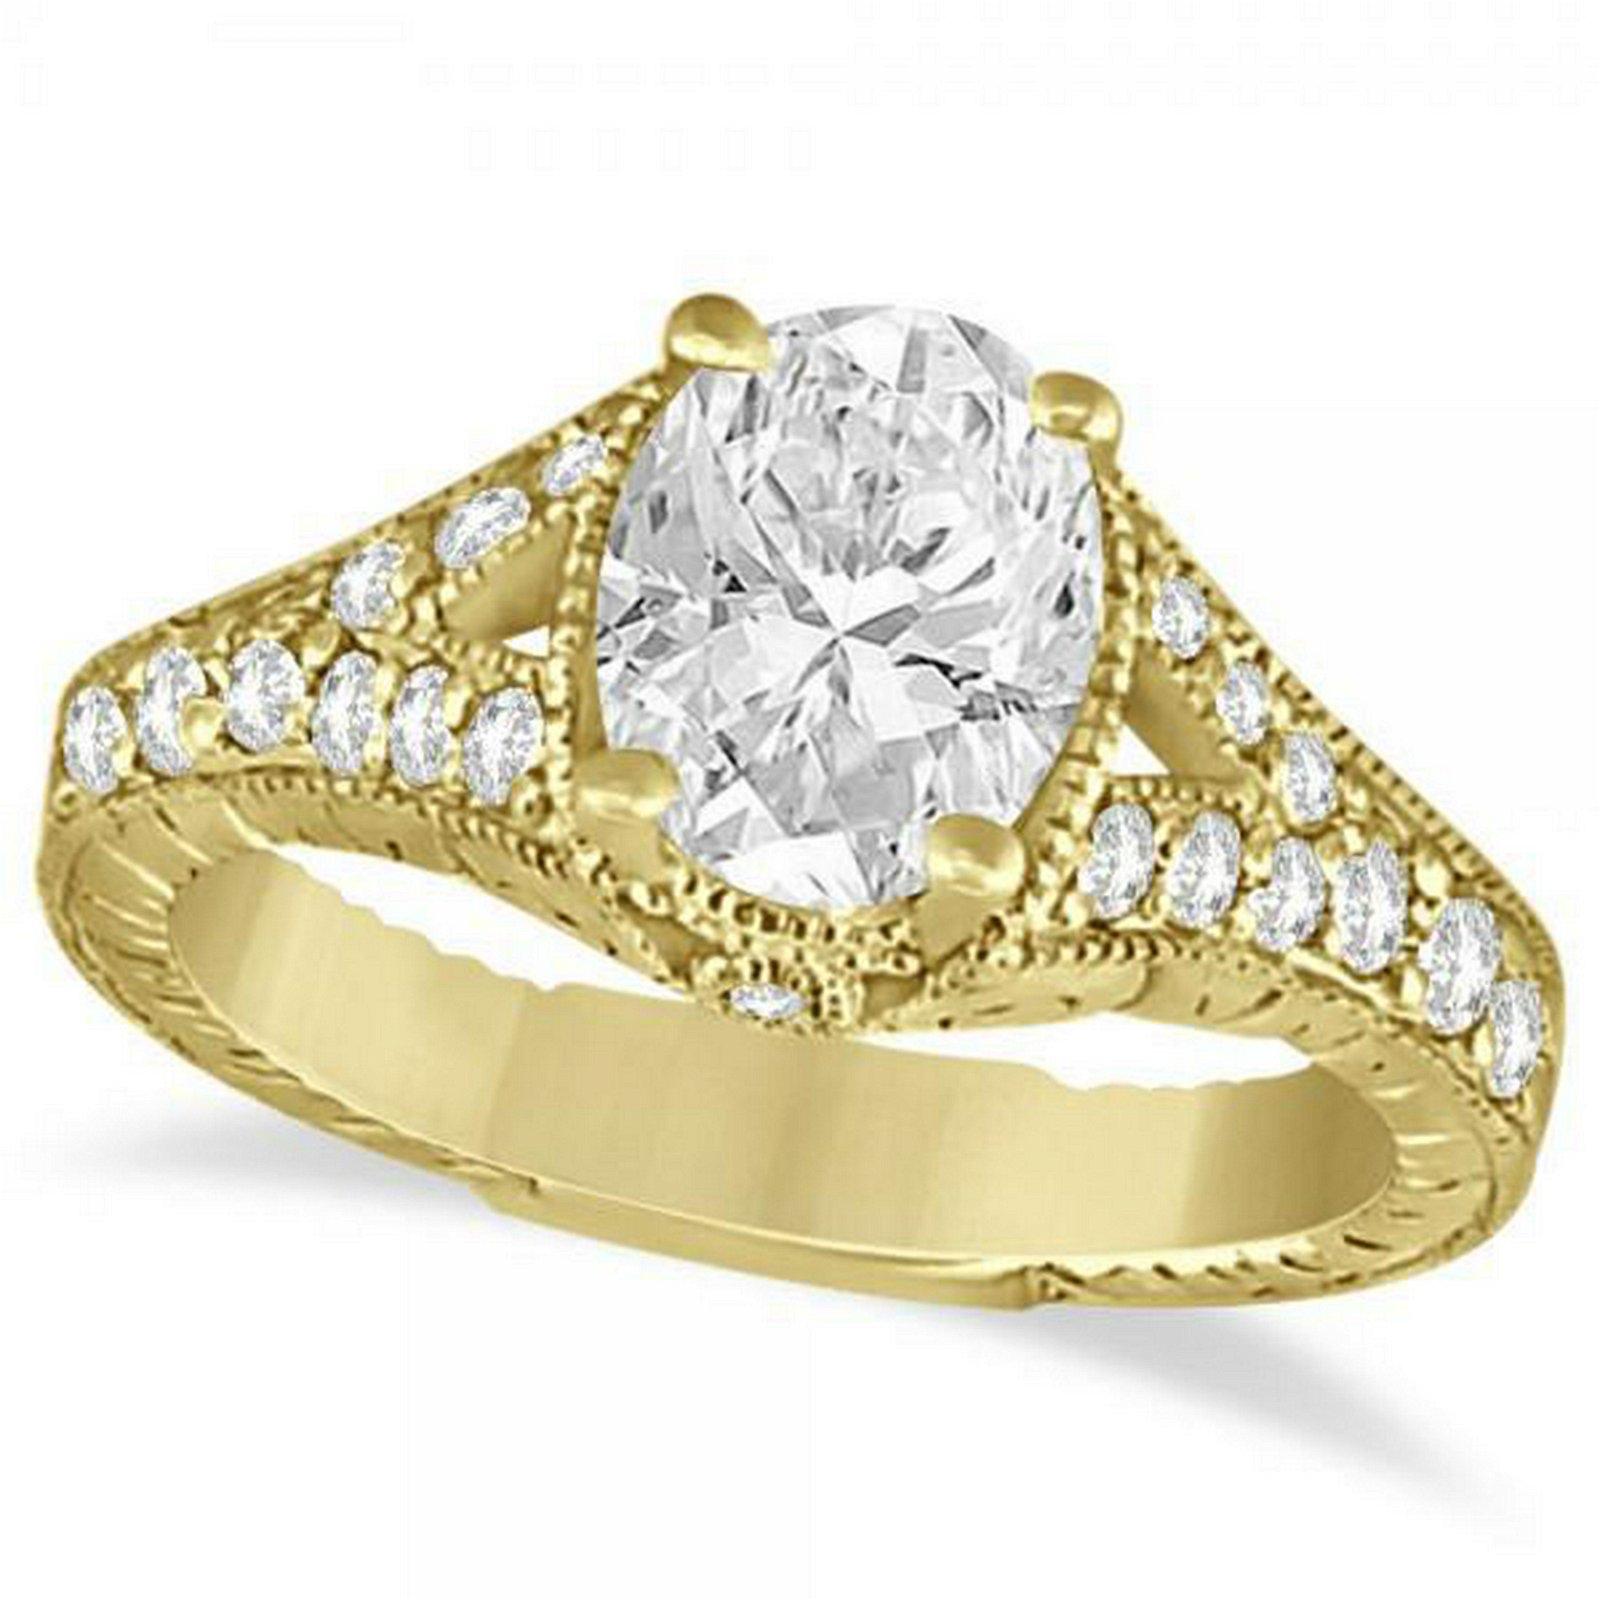 Antique Art Deco Oval Diamond Engagement Ring 14K Yello